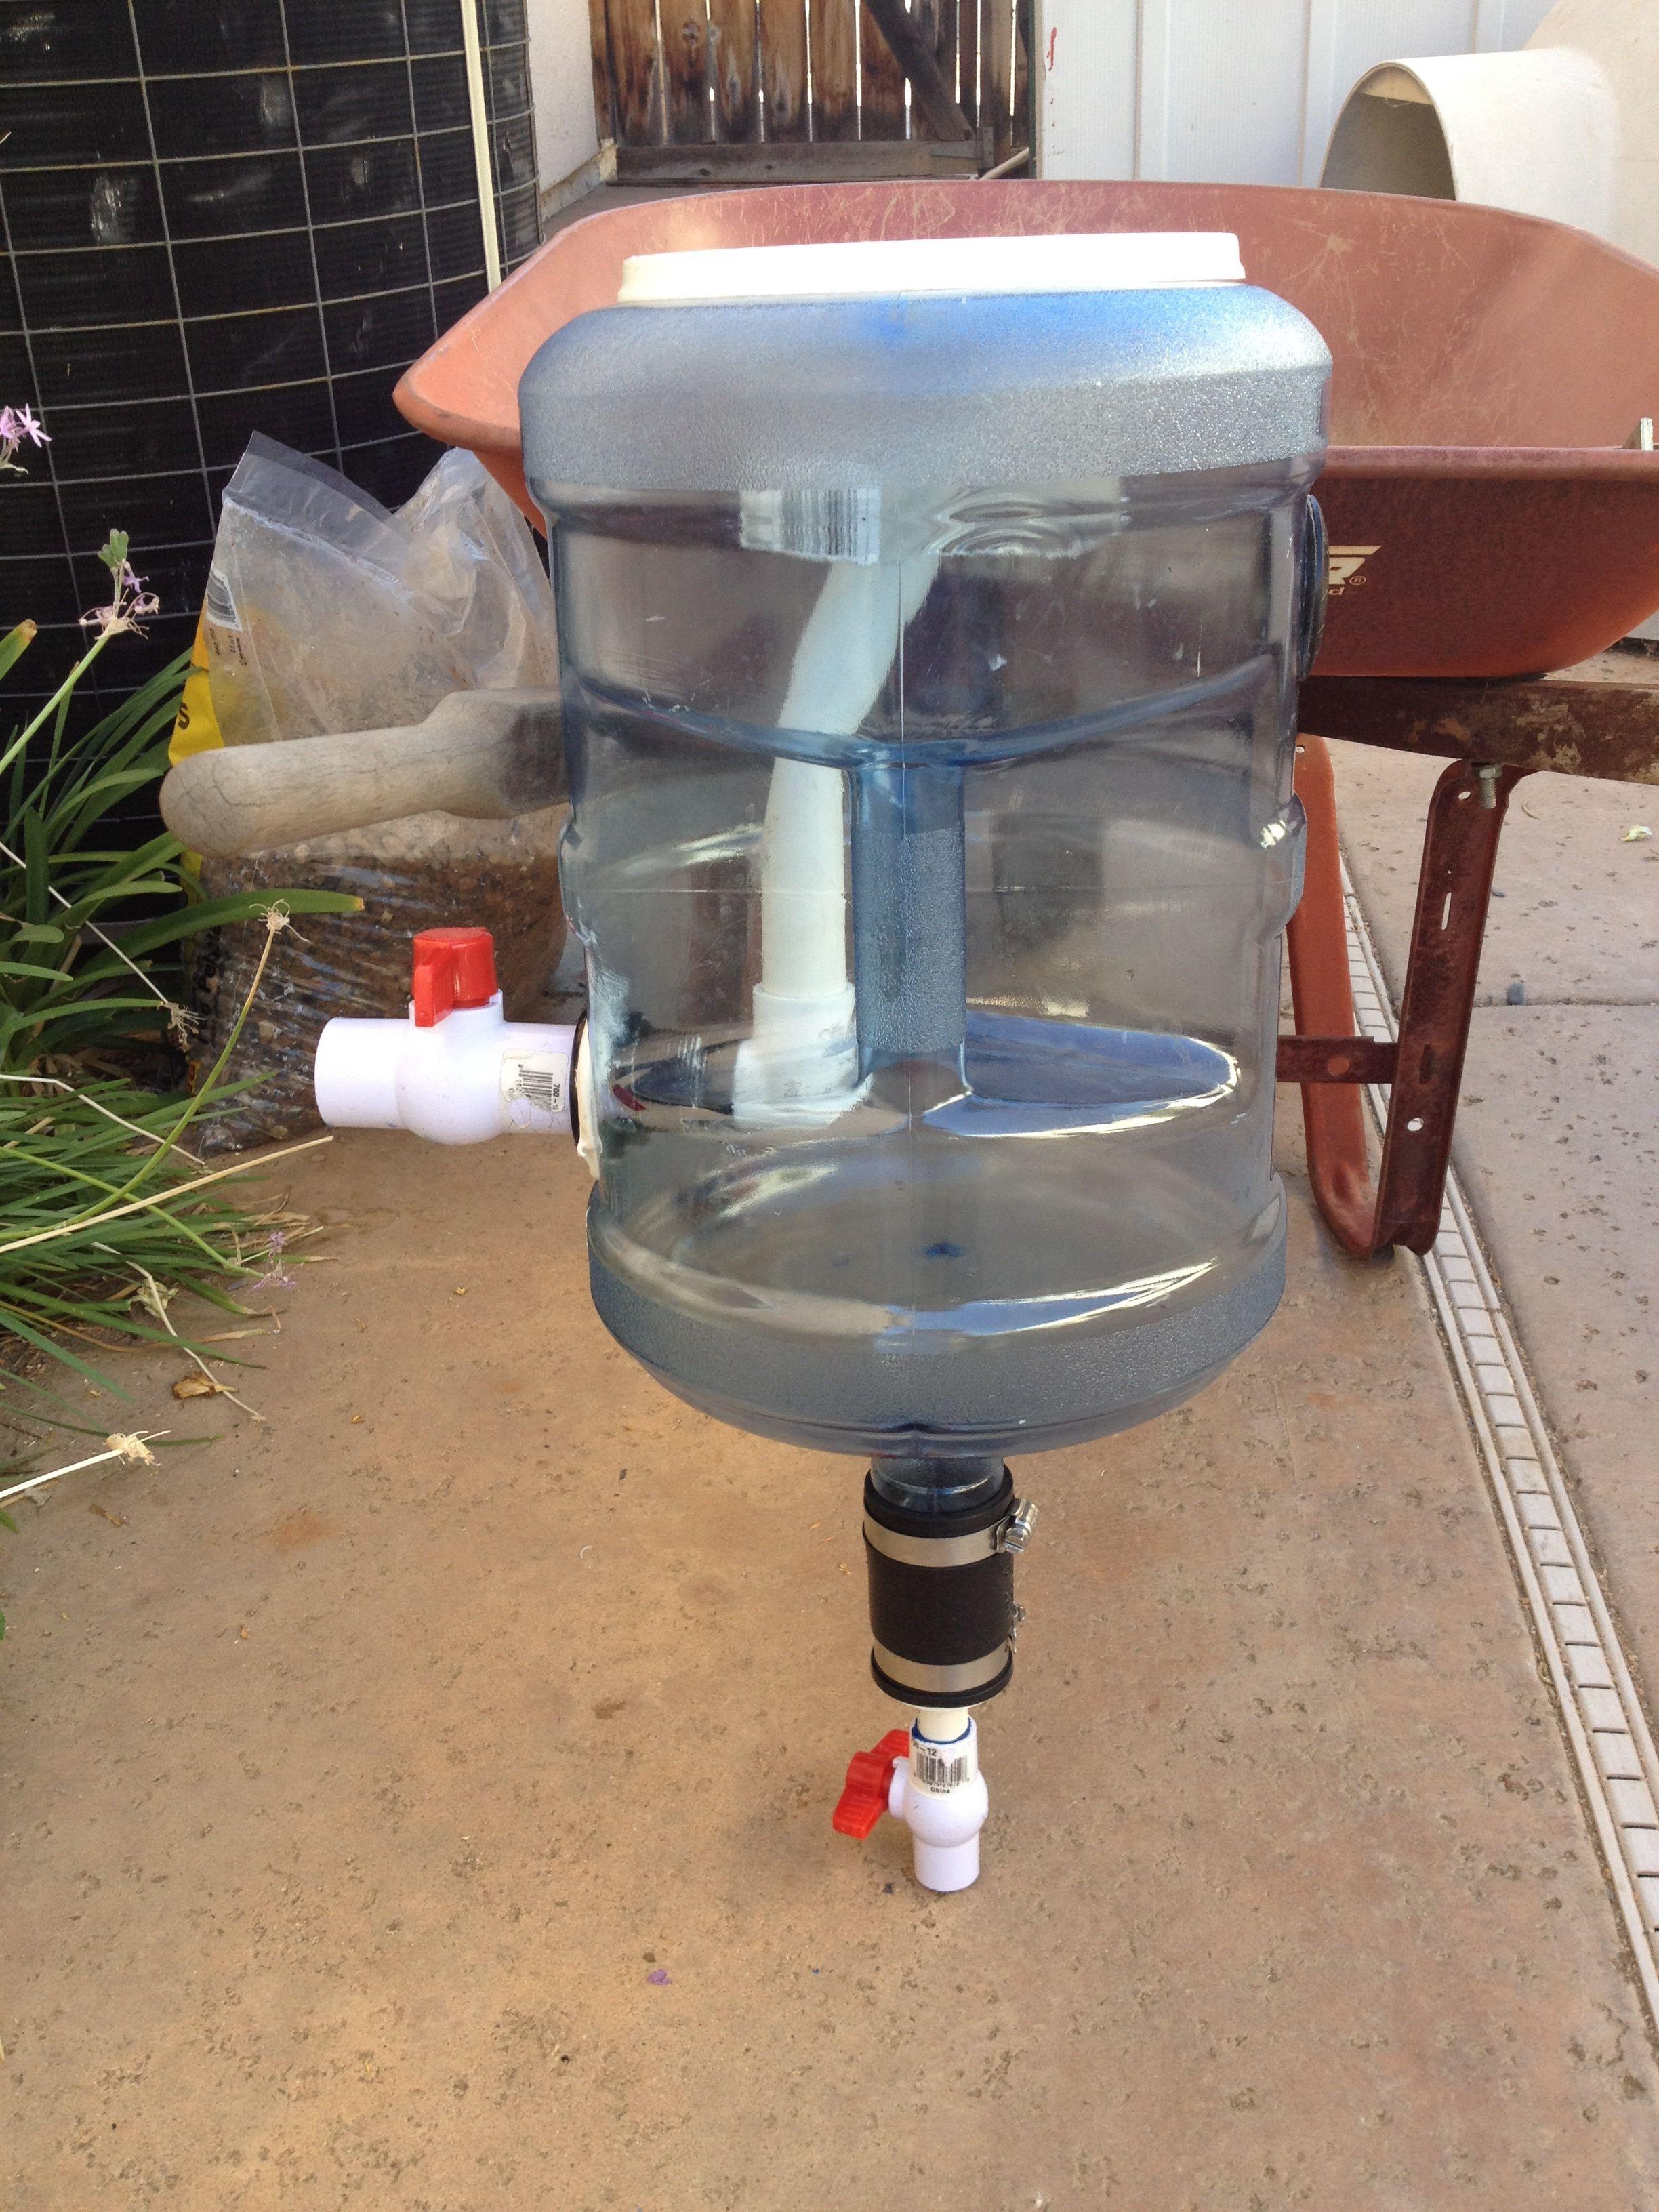 Fotos - San Diego Aquaponic Society (San Diego, CA) | Meetup